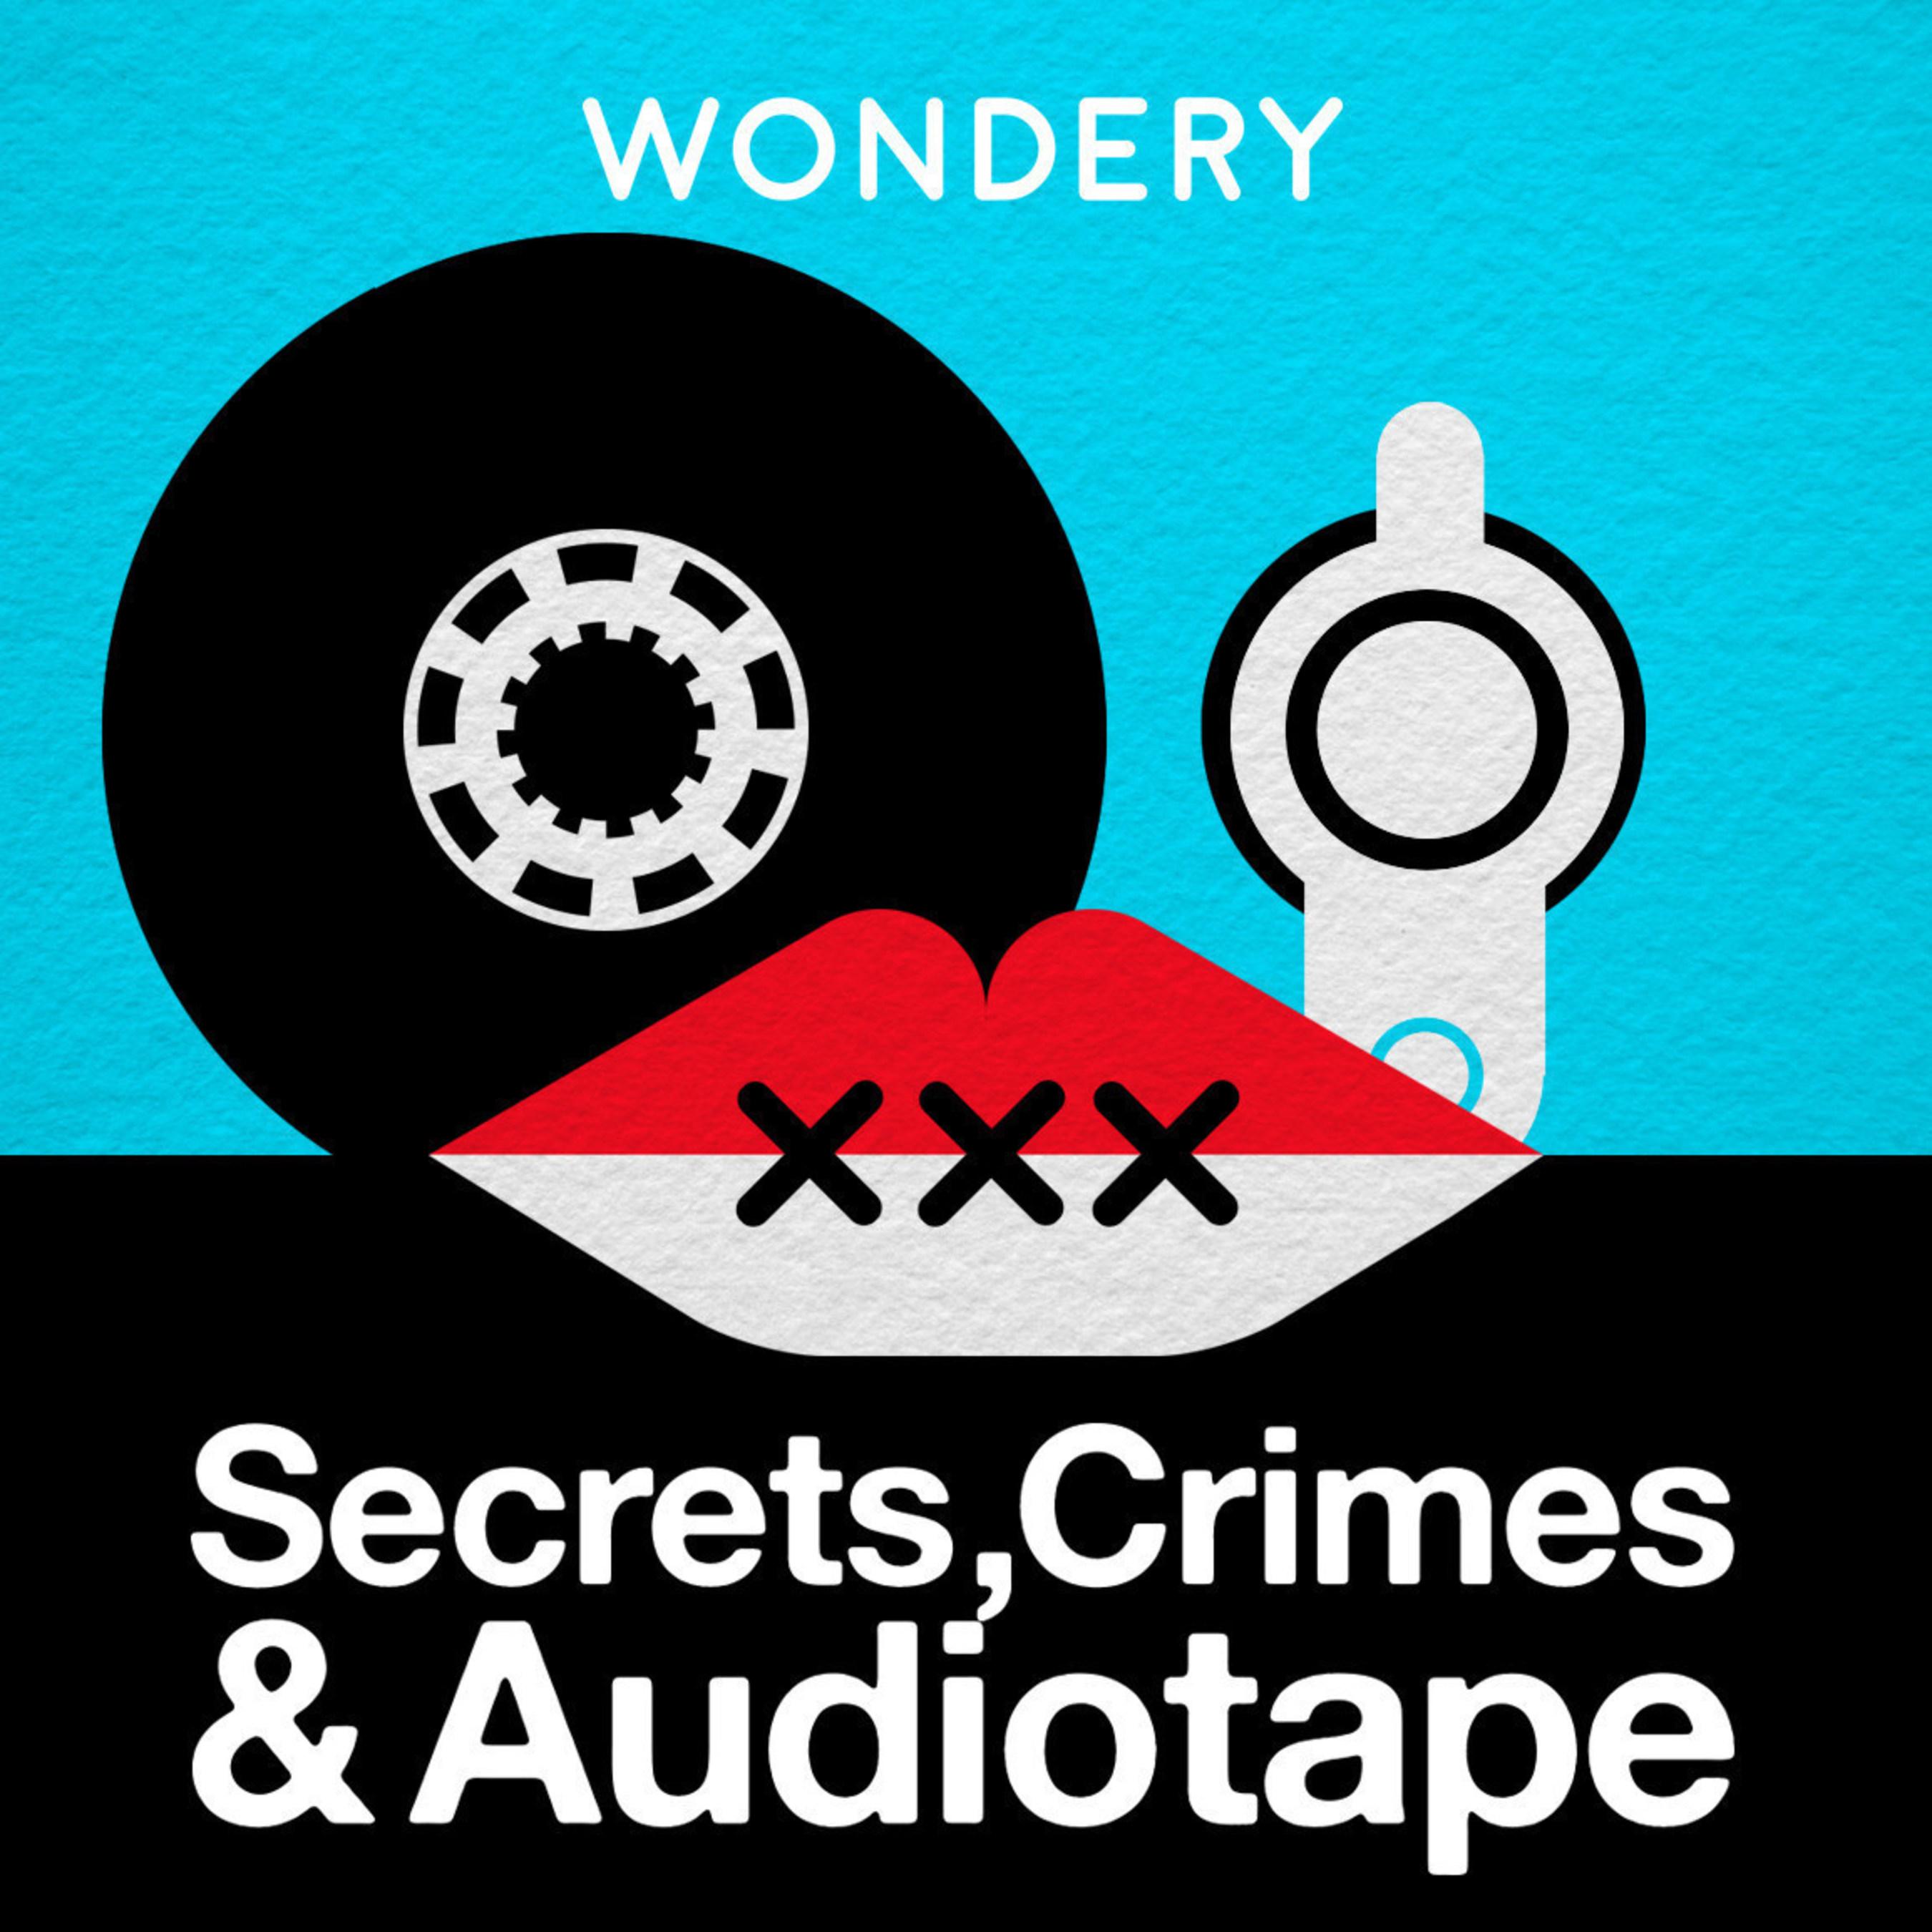 Wondery Announces Launch Of Signature Scripted Audio Drama 'Secrets, Crimes & Audiotape'